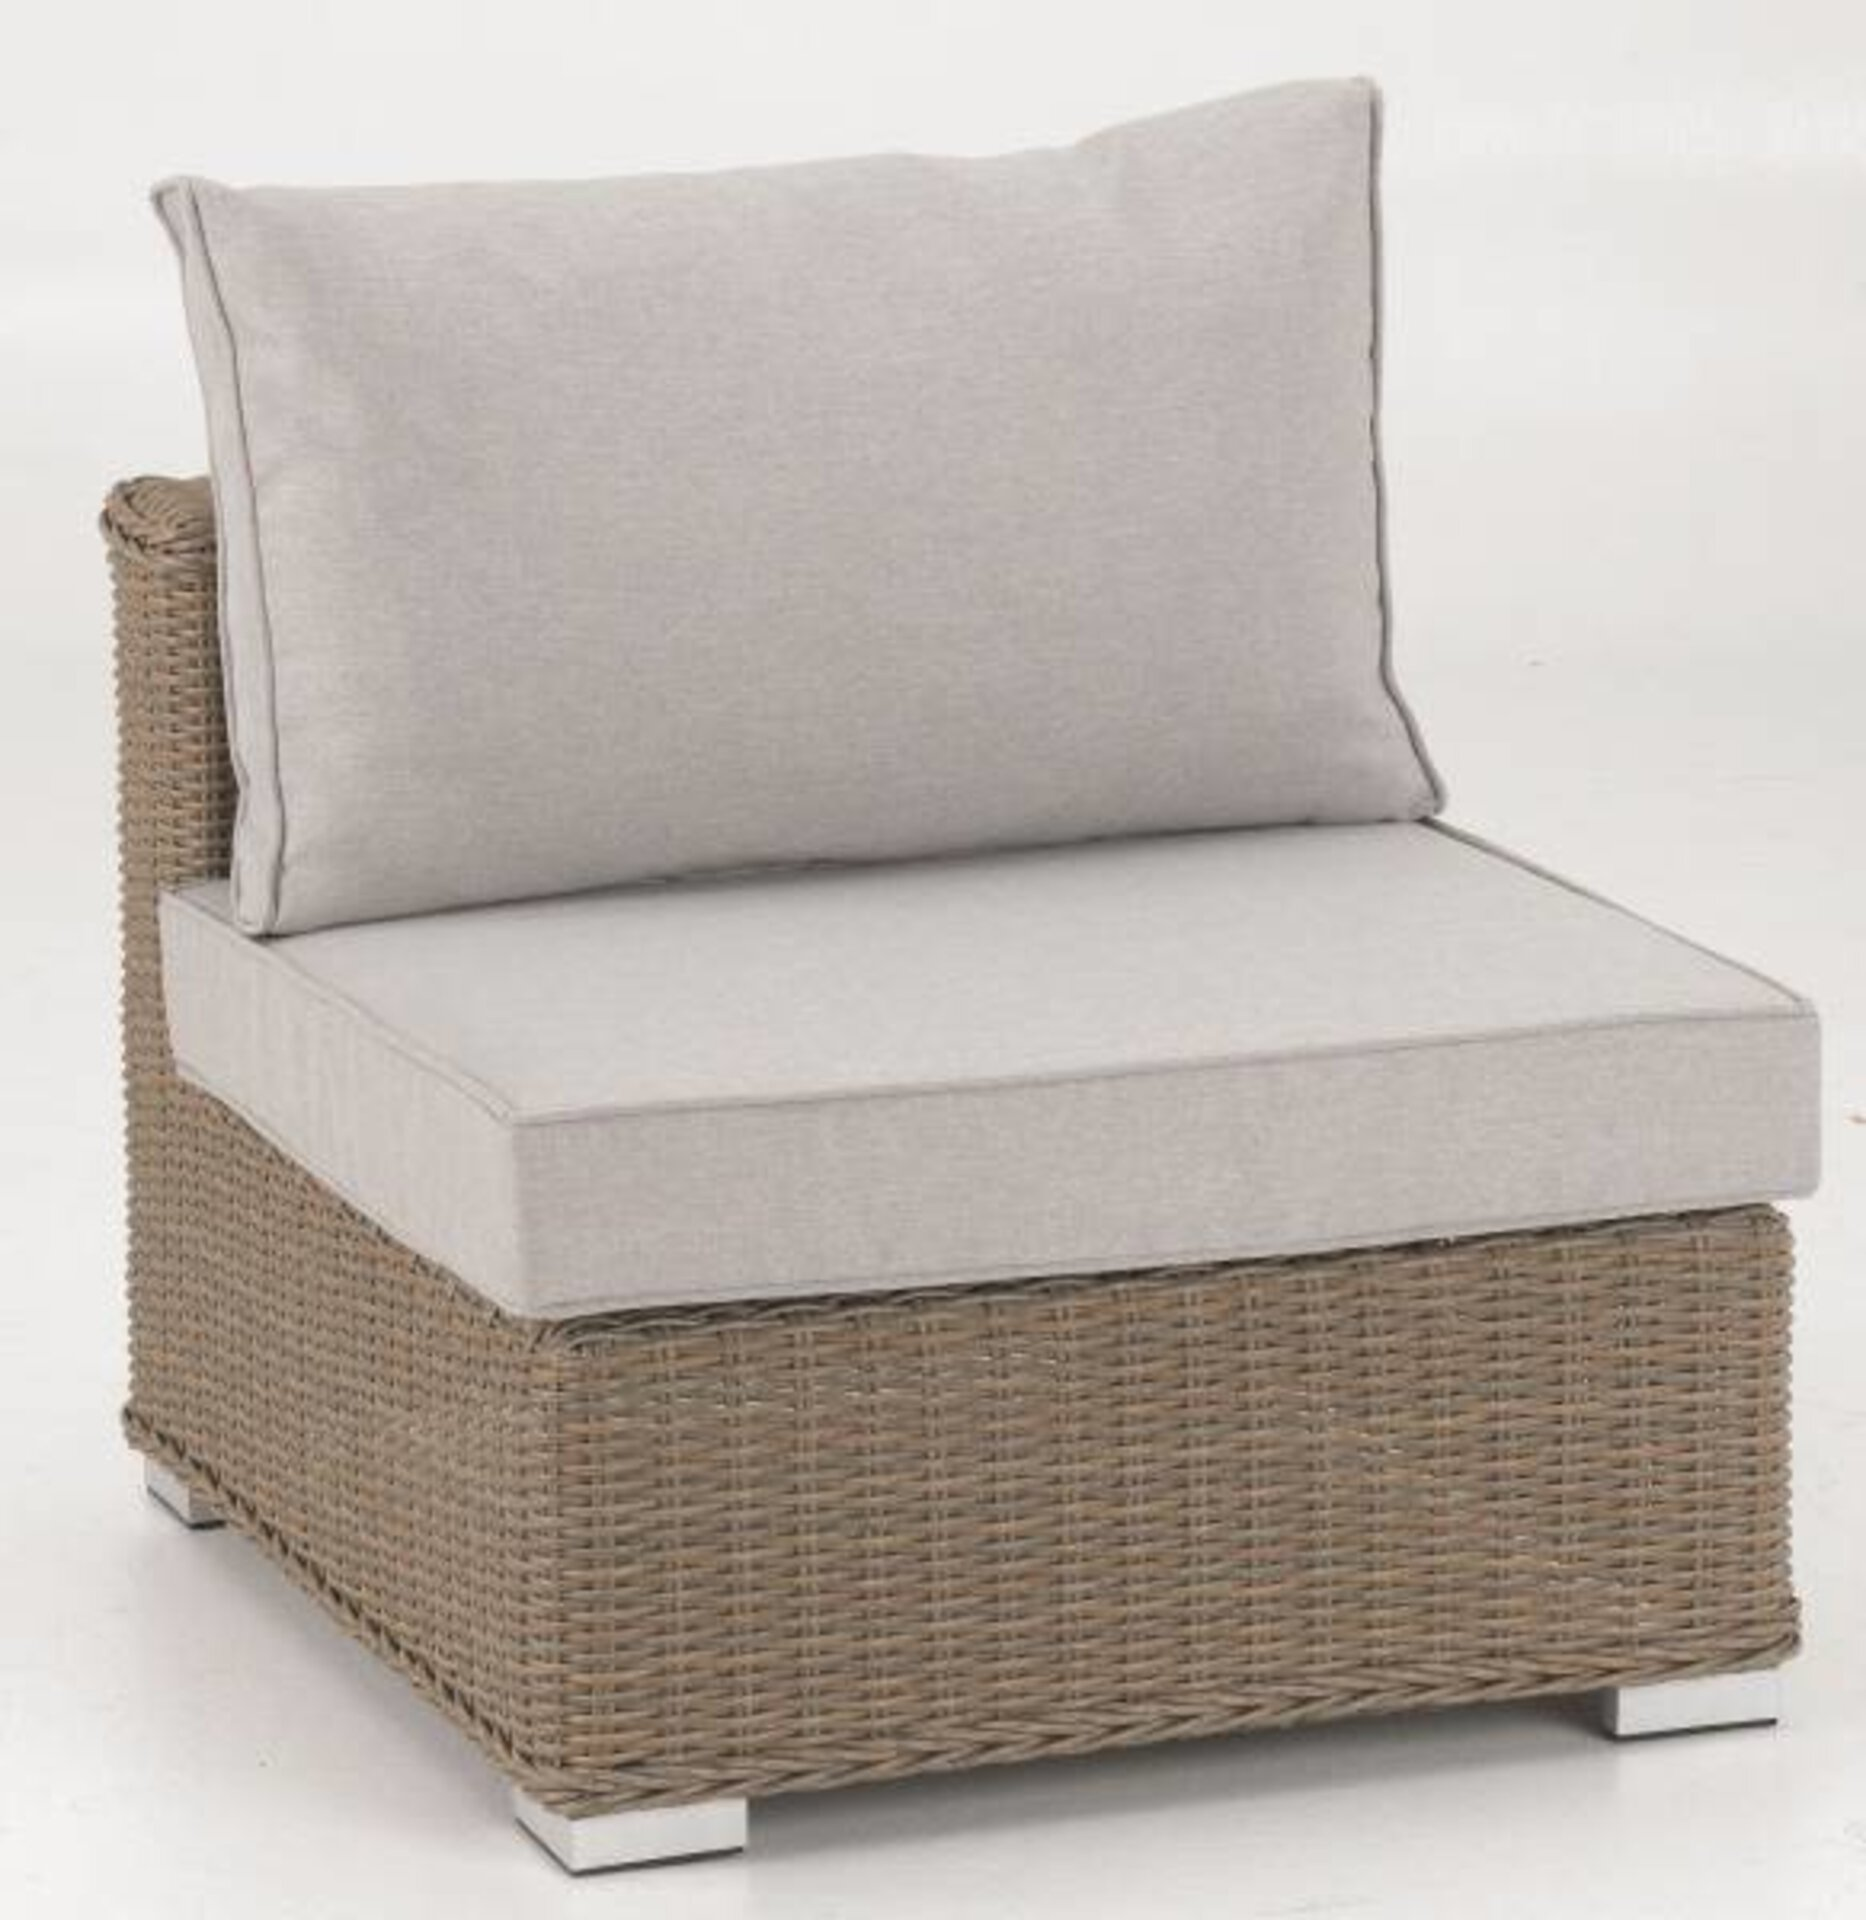 Mittelelement TAHITI Outdoor Textil 74 x 64 x 86 cm